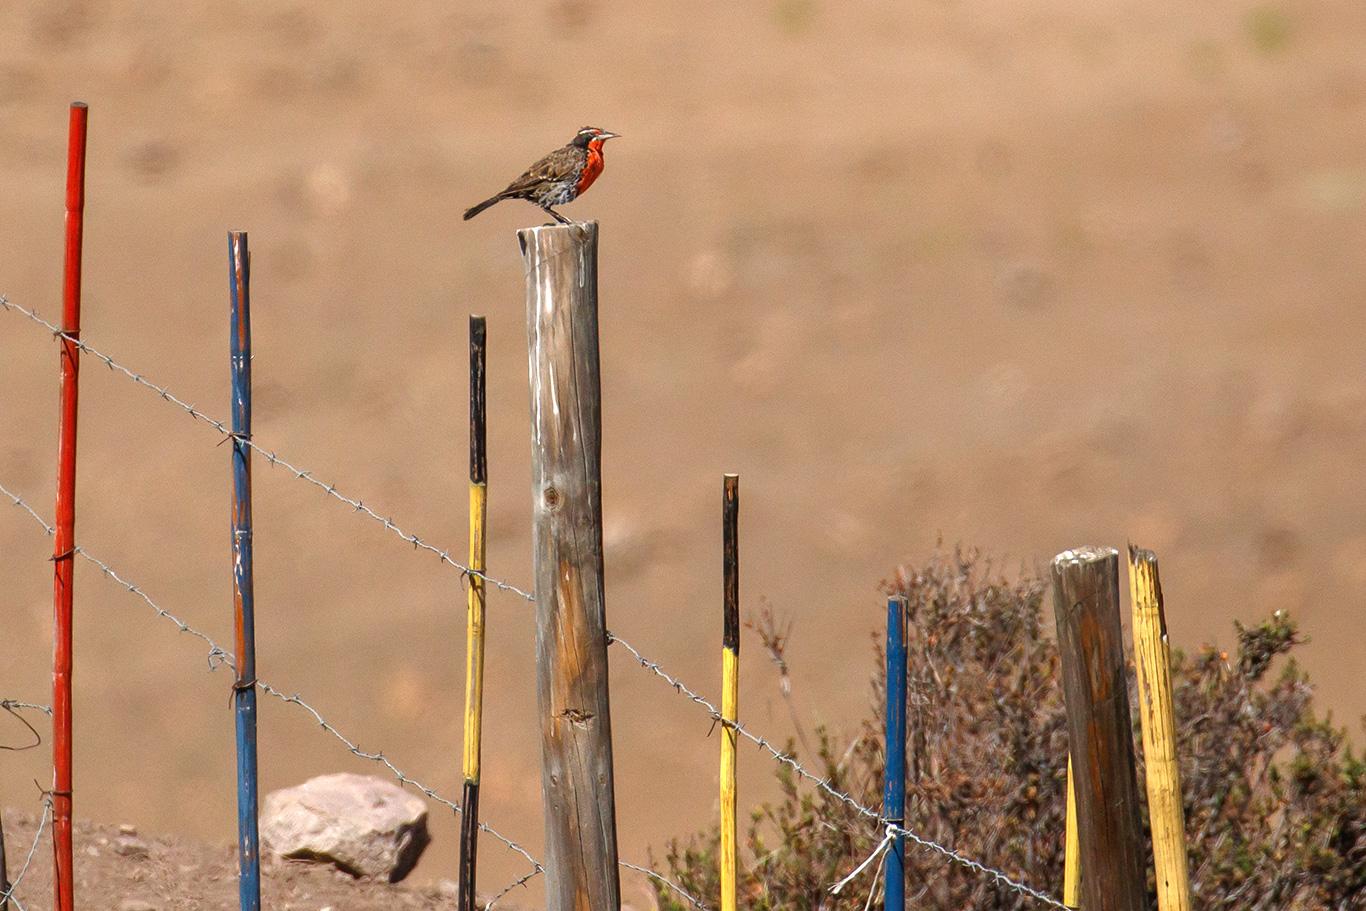 Long-tailed Meadowlark, Camino a Farellones, Chile.